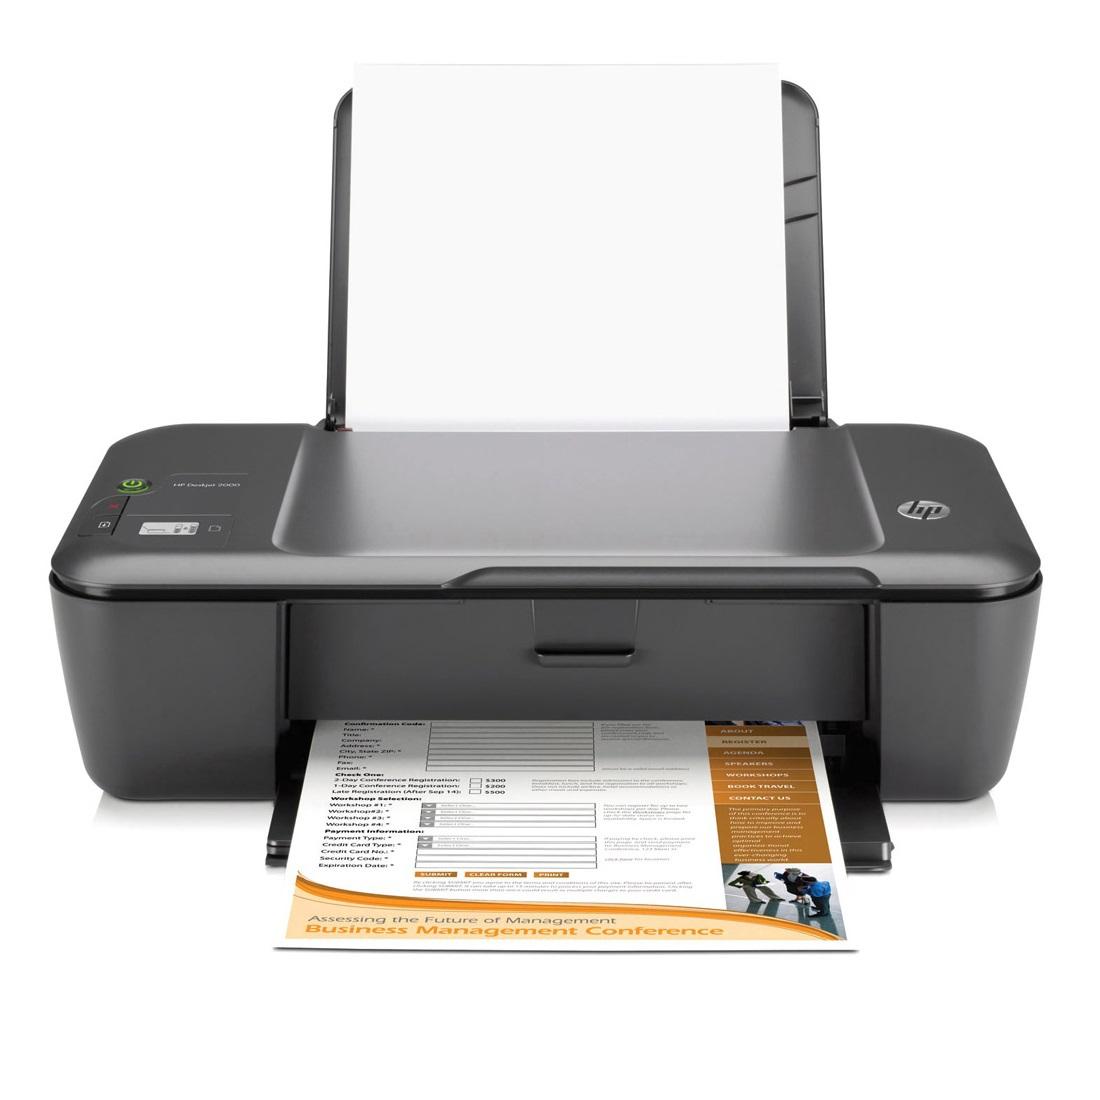 Hp Laserjet Cm2320nf Scan Software HP